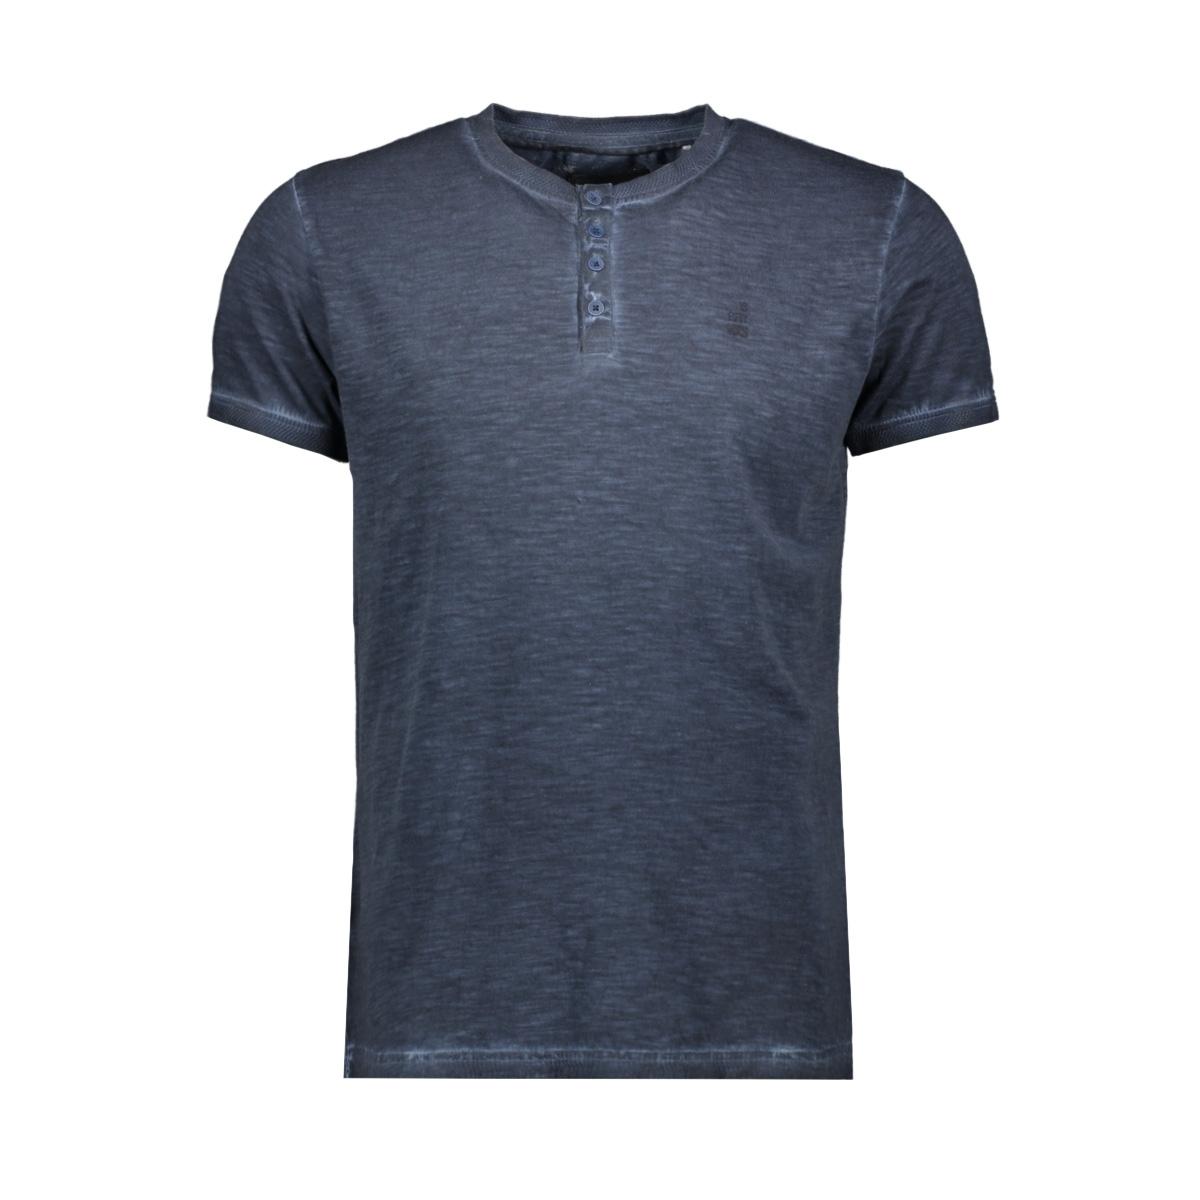 t shirt 90350419 no-excess t-shirt 078 night